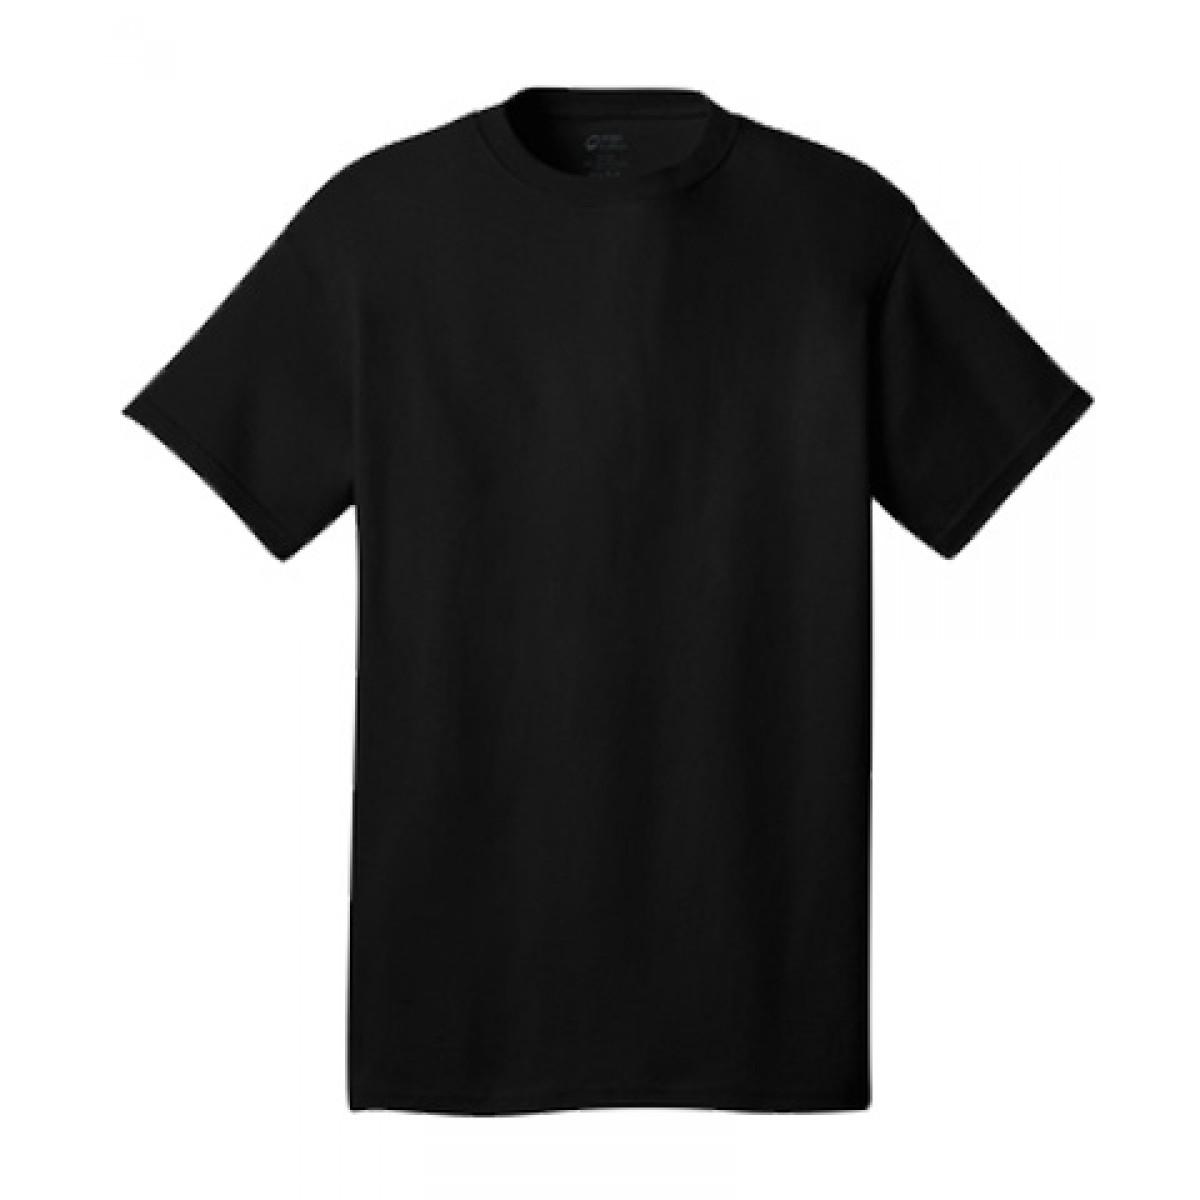 Soft 100% Cotton T-Shirt-Black-YM